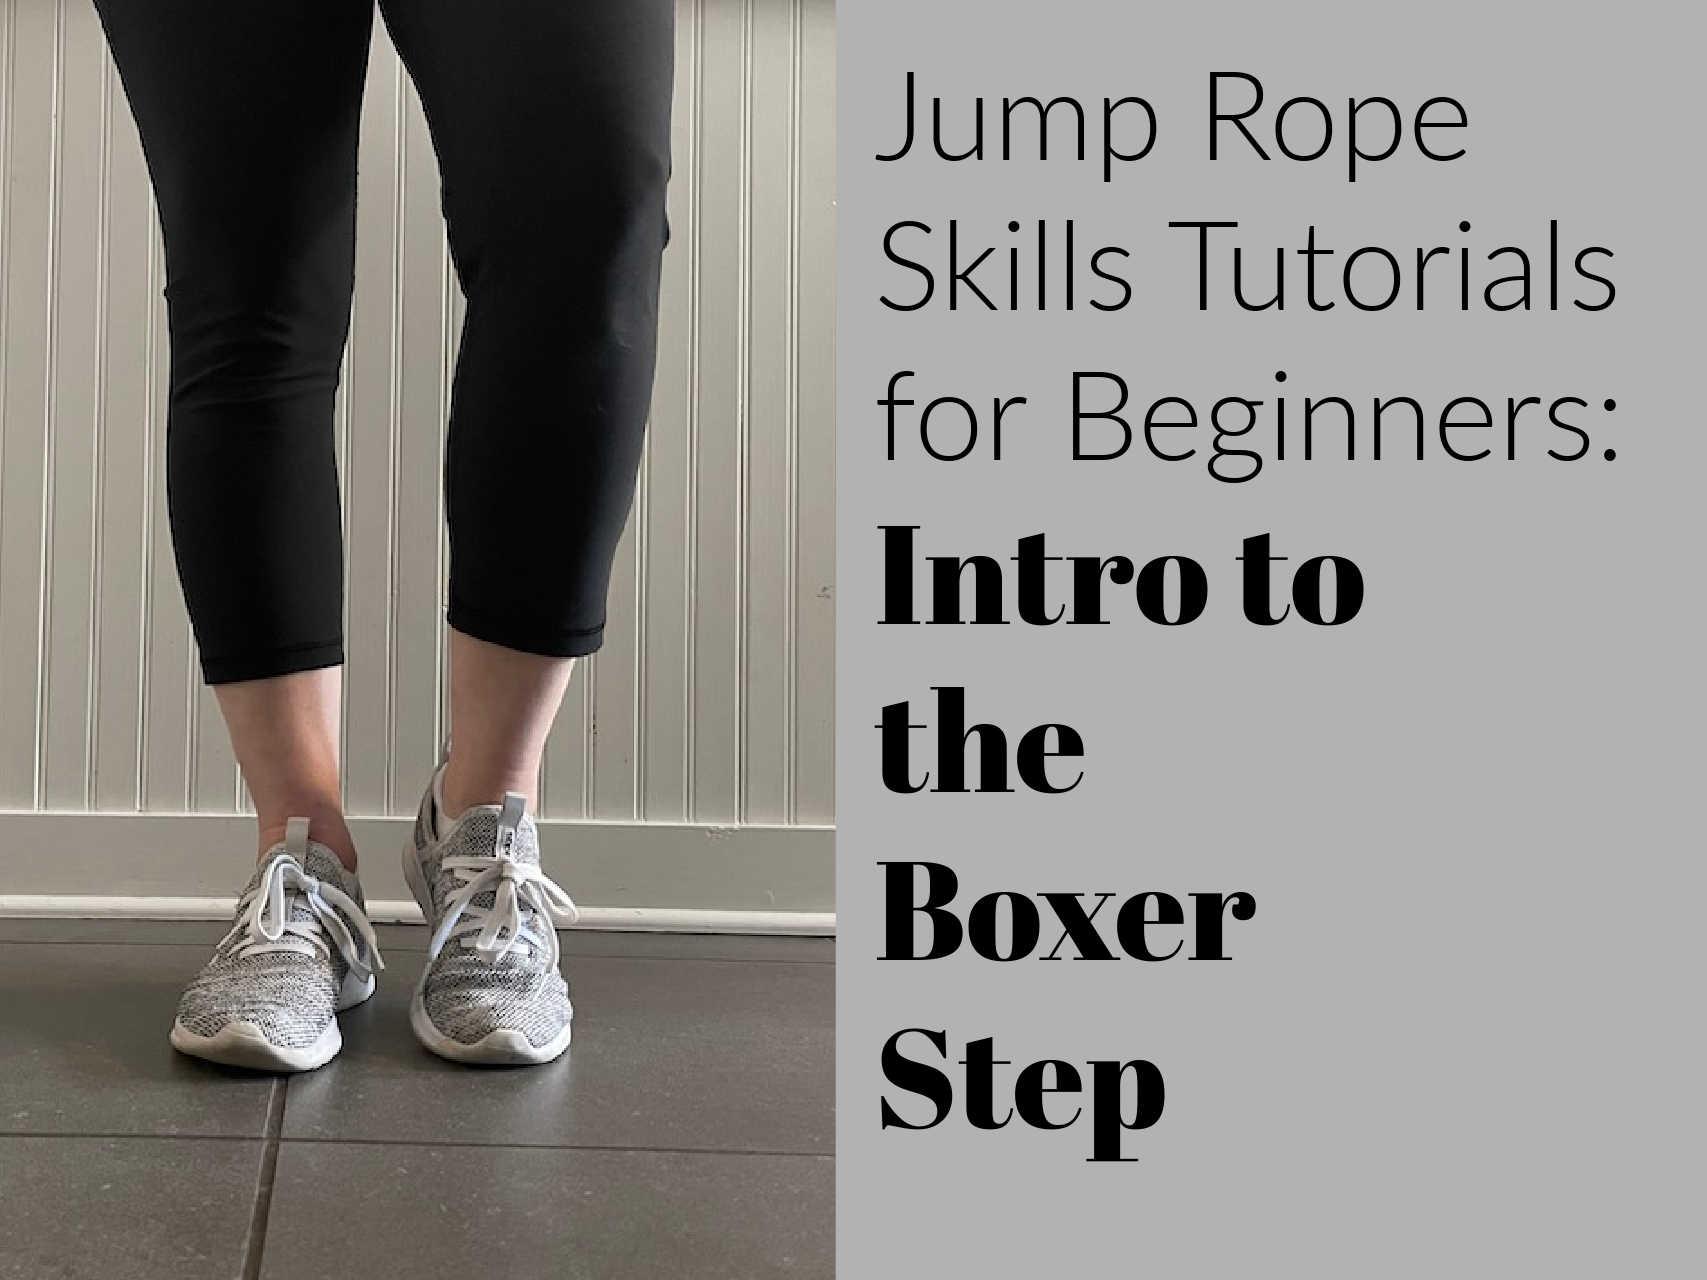 Jump Rope Boxer Step